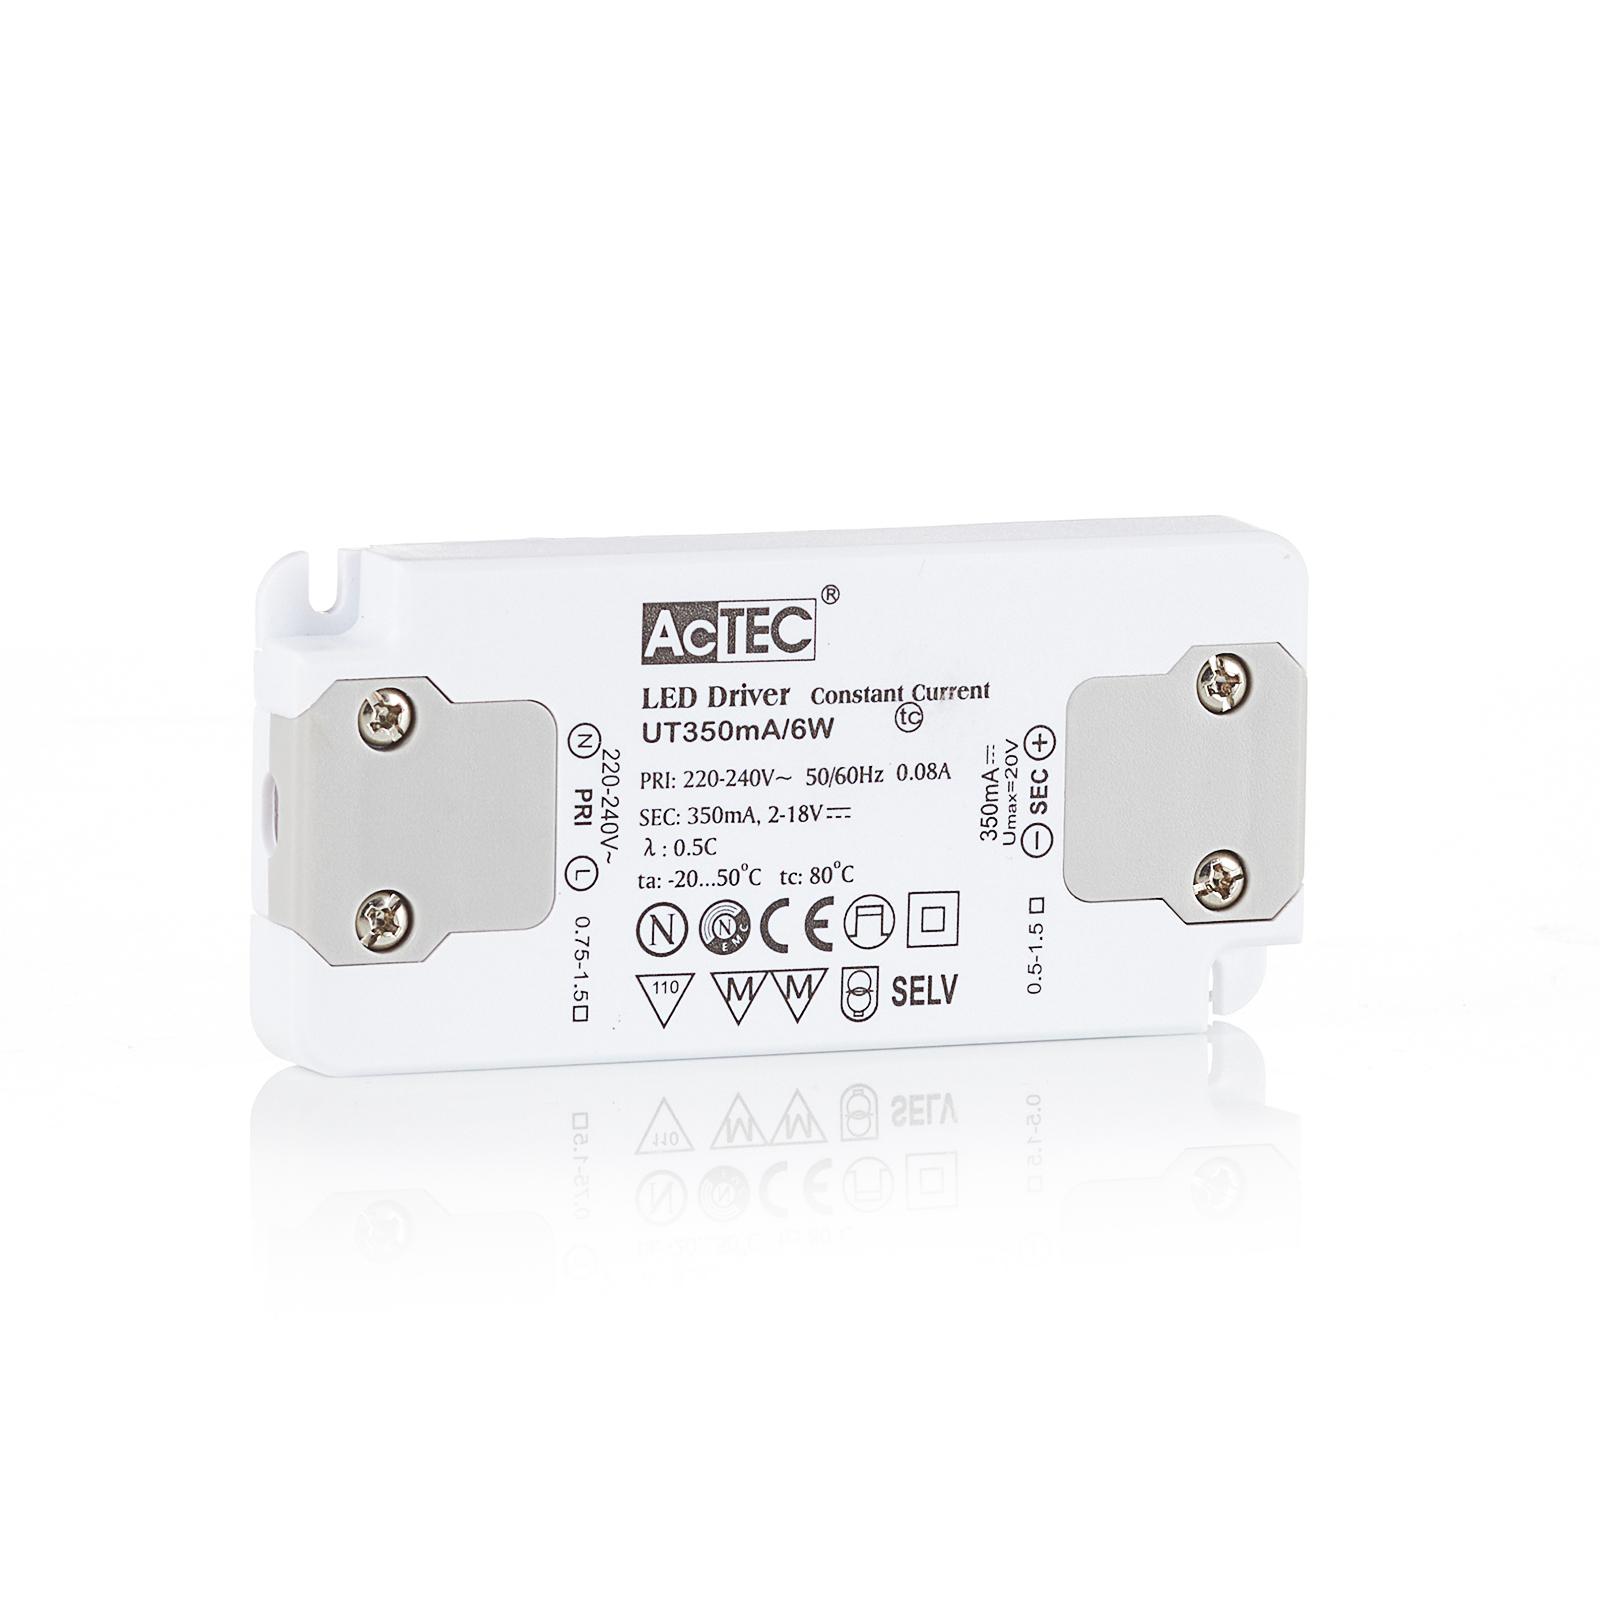 AcTEC Slim LED-drivare CC 350mA, 6W